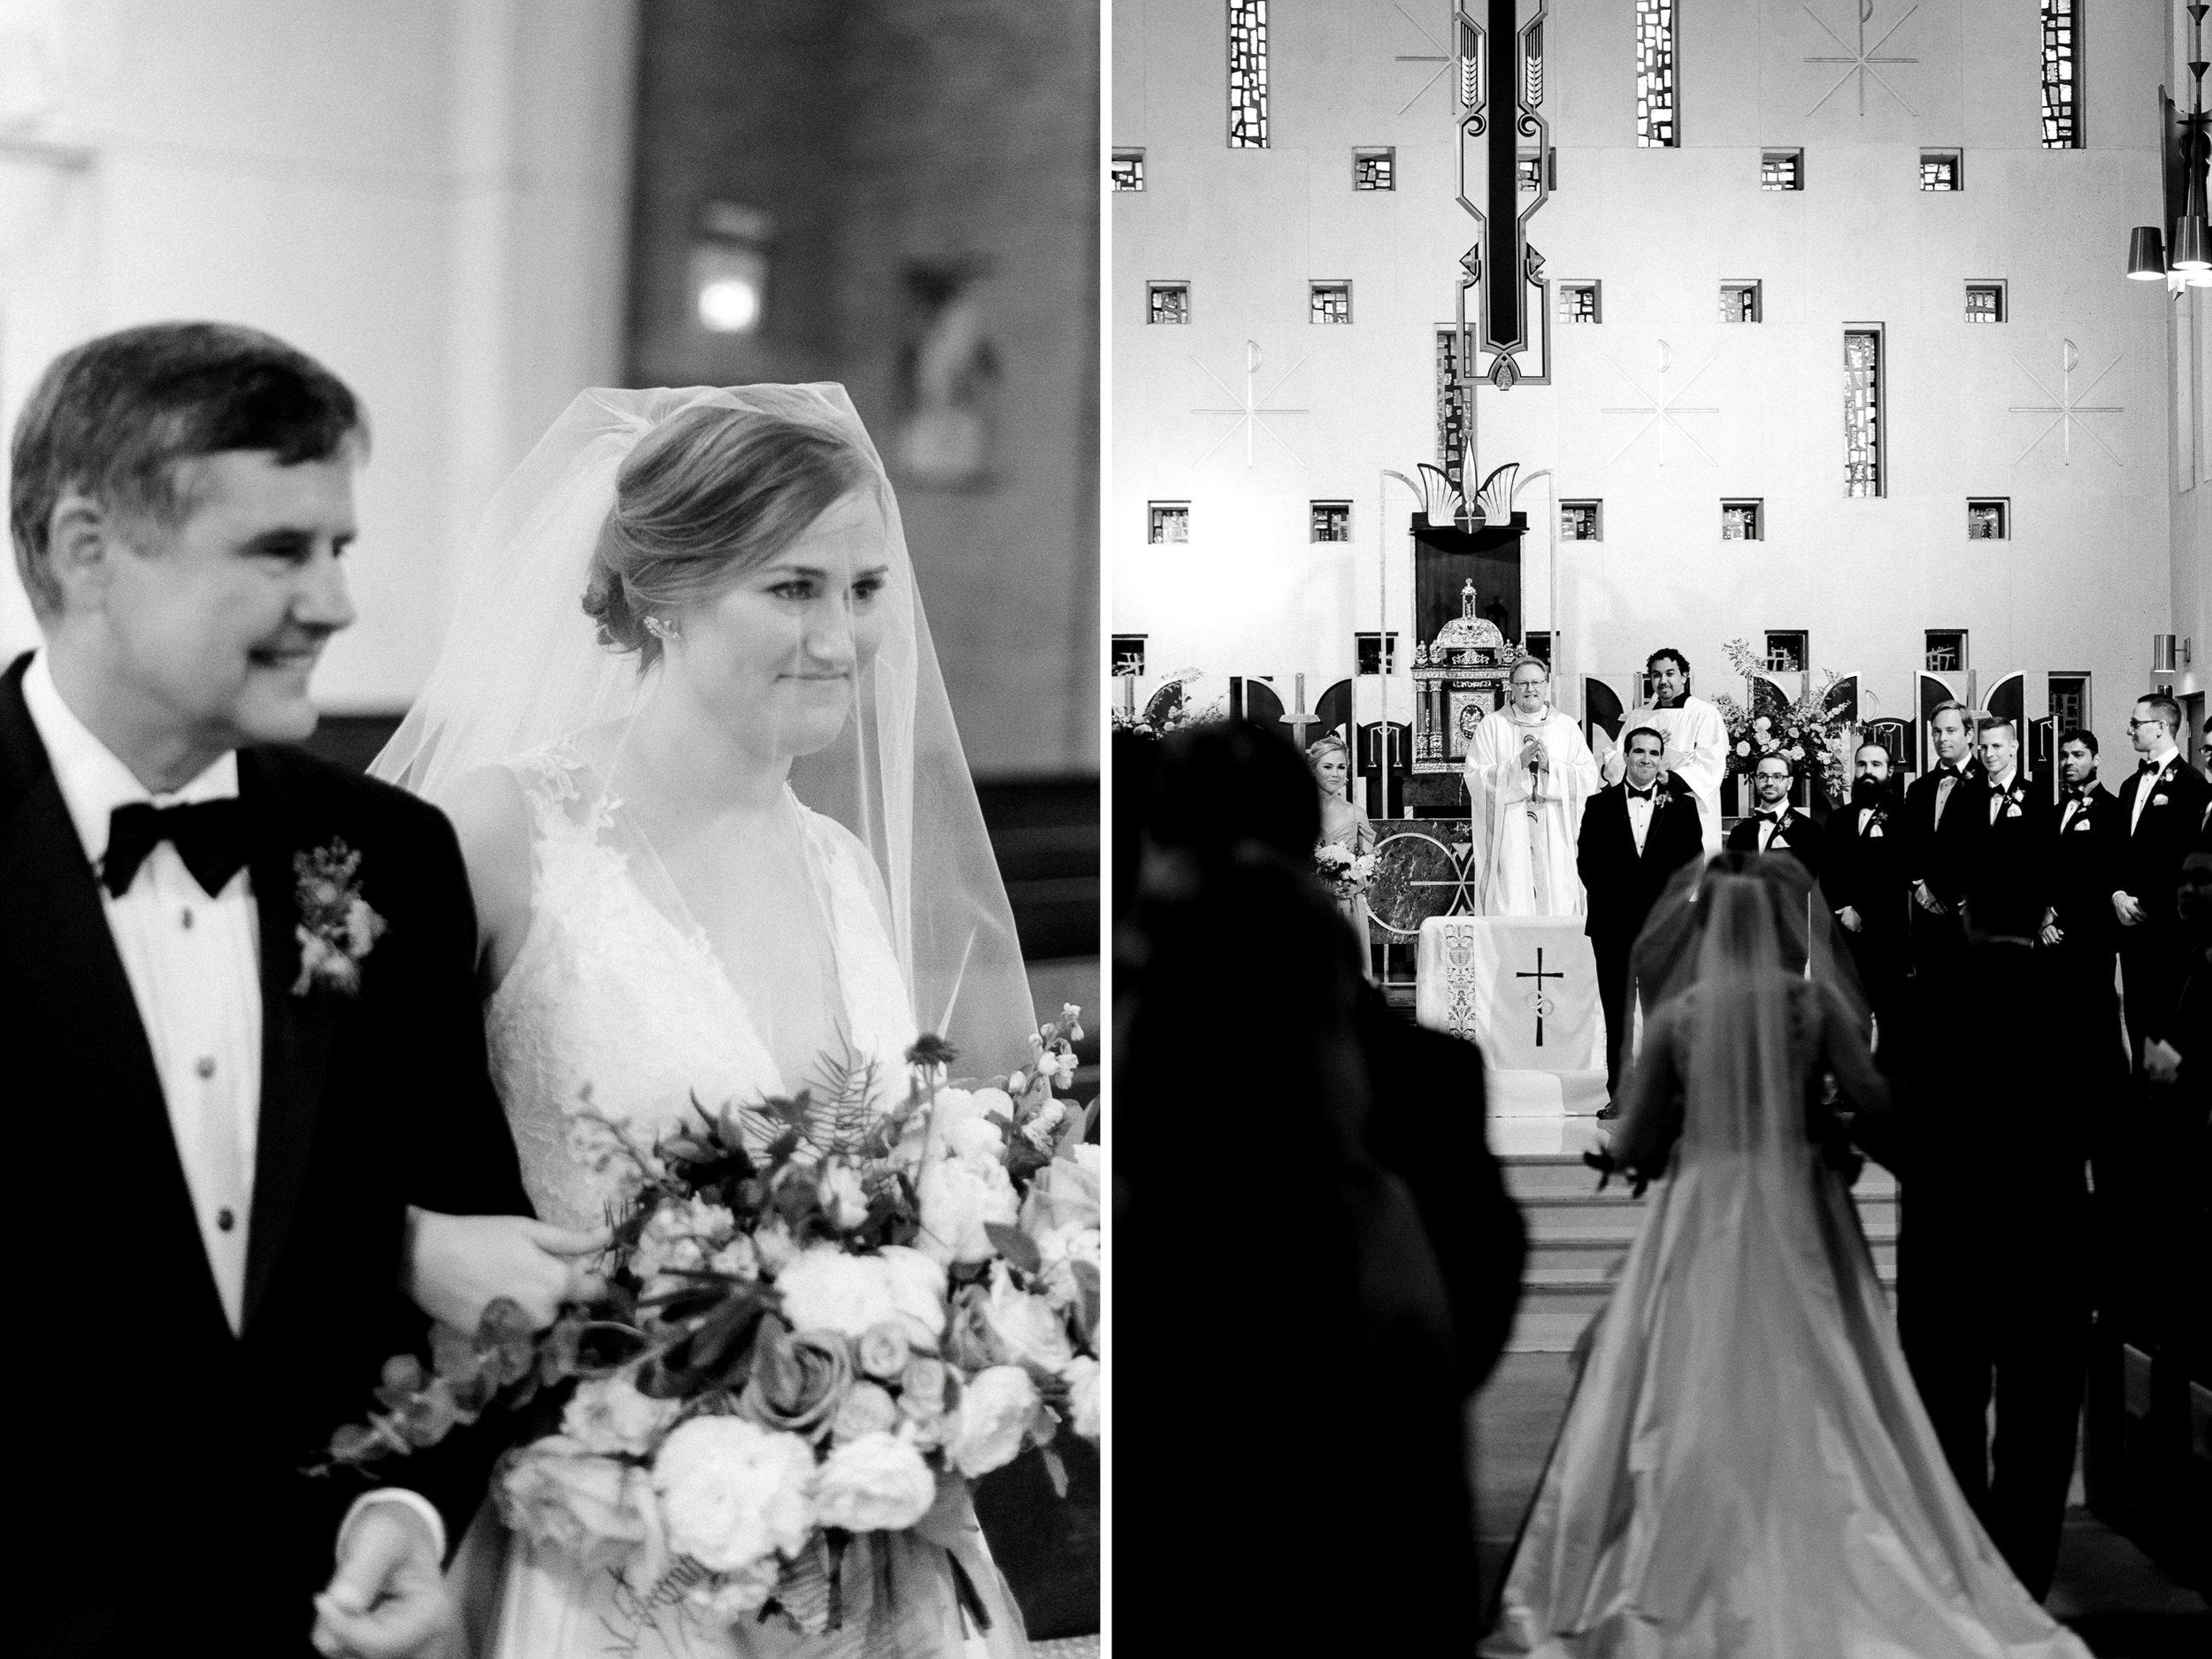 St-Michaels-Catholic-Church-Houston-Wedding-Ceremony-Josh-Dana-Fernandez-Photographer-Destination-Austin-Dallas-Fine-Art-Film-102.jpg